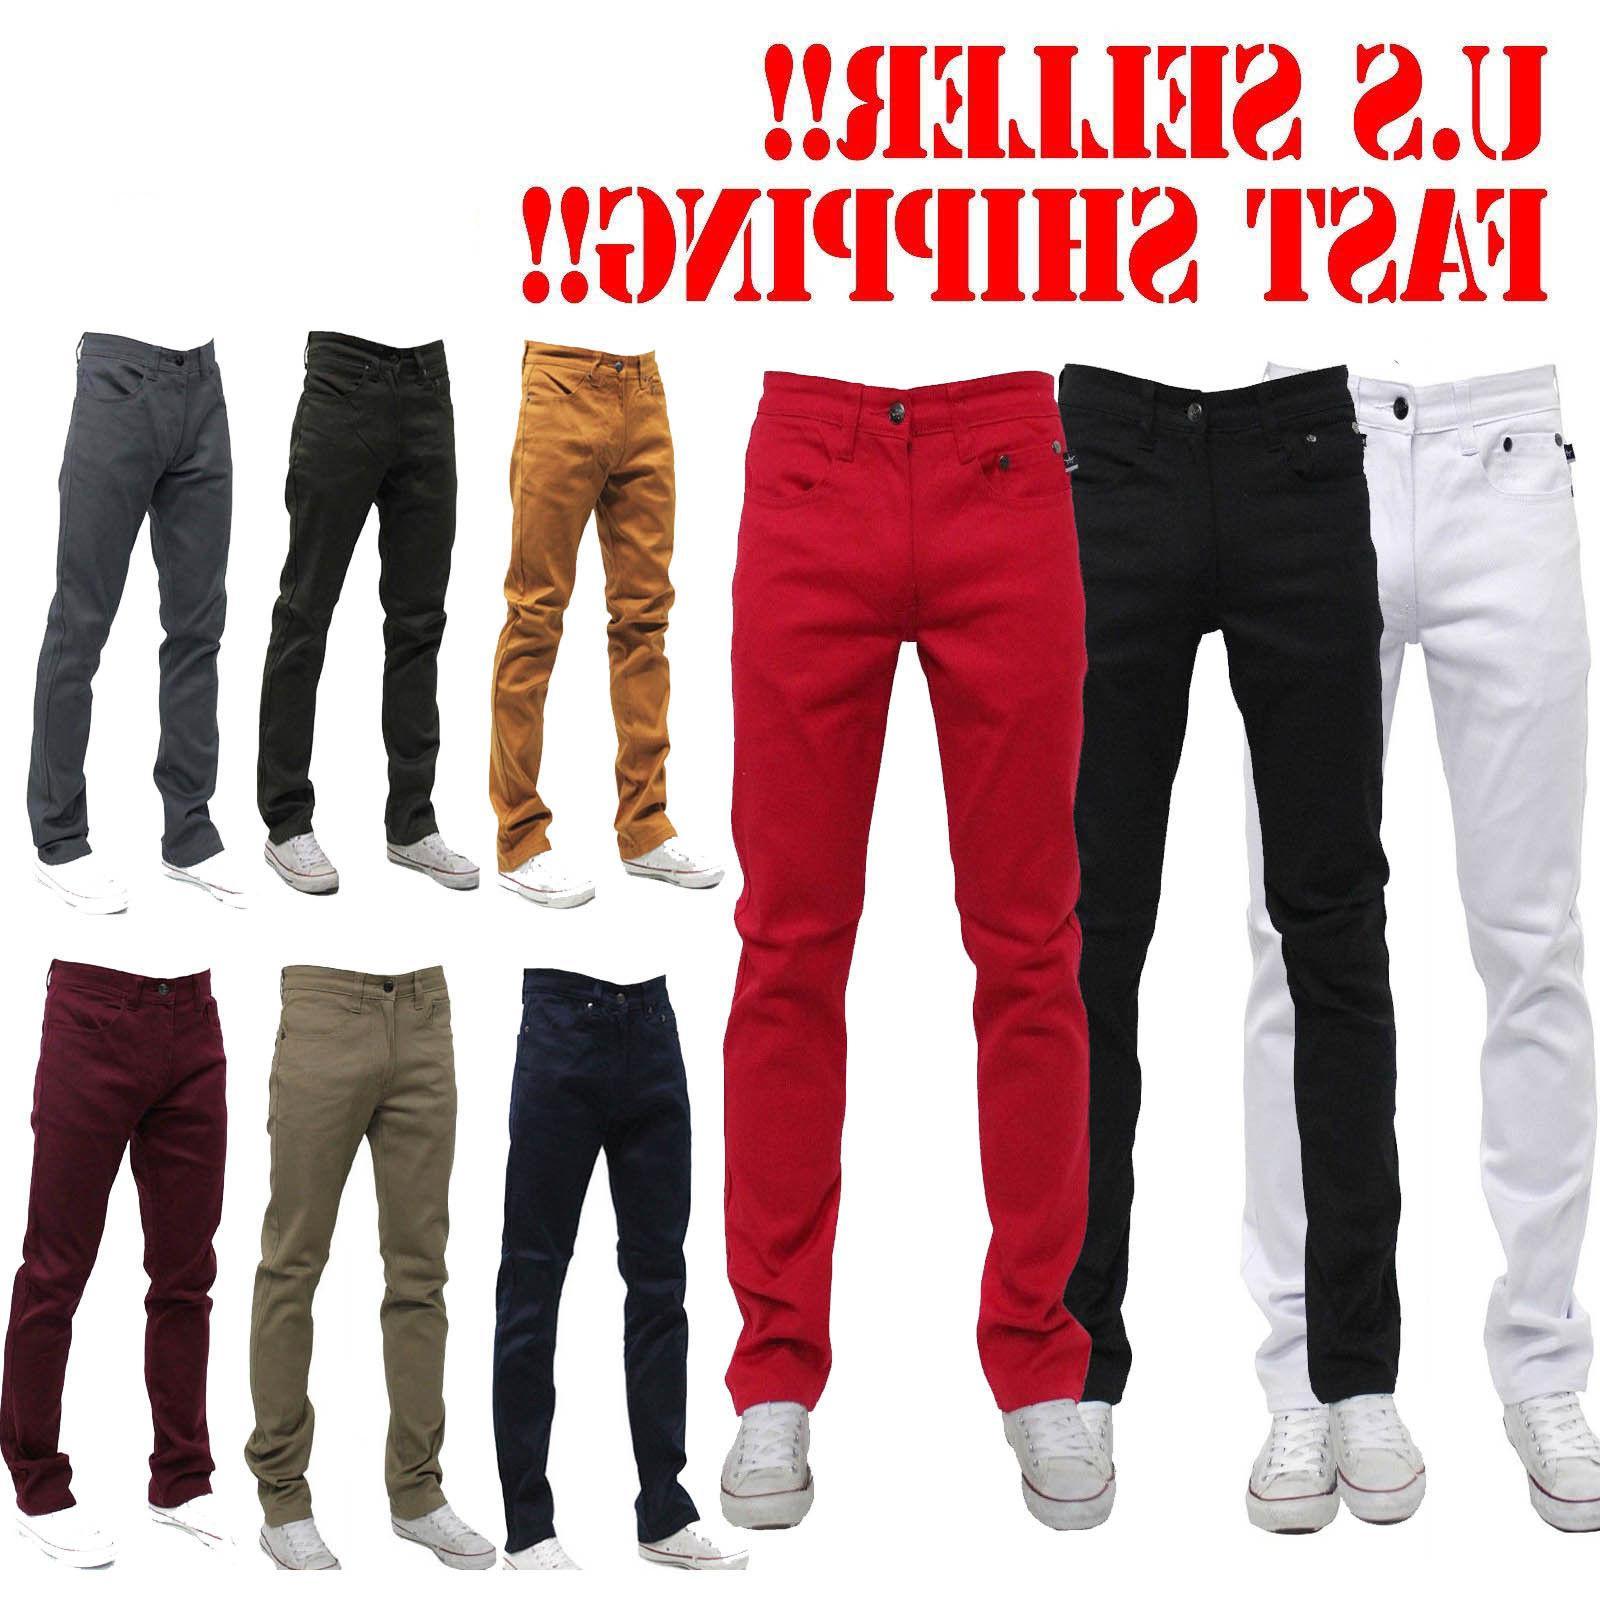 MEN Jeans Slim FIT Casual Pants SKINNY STYLE